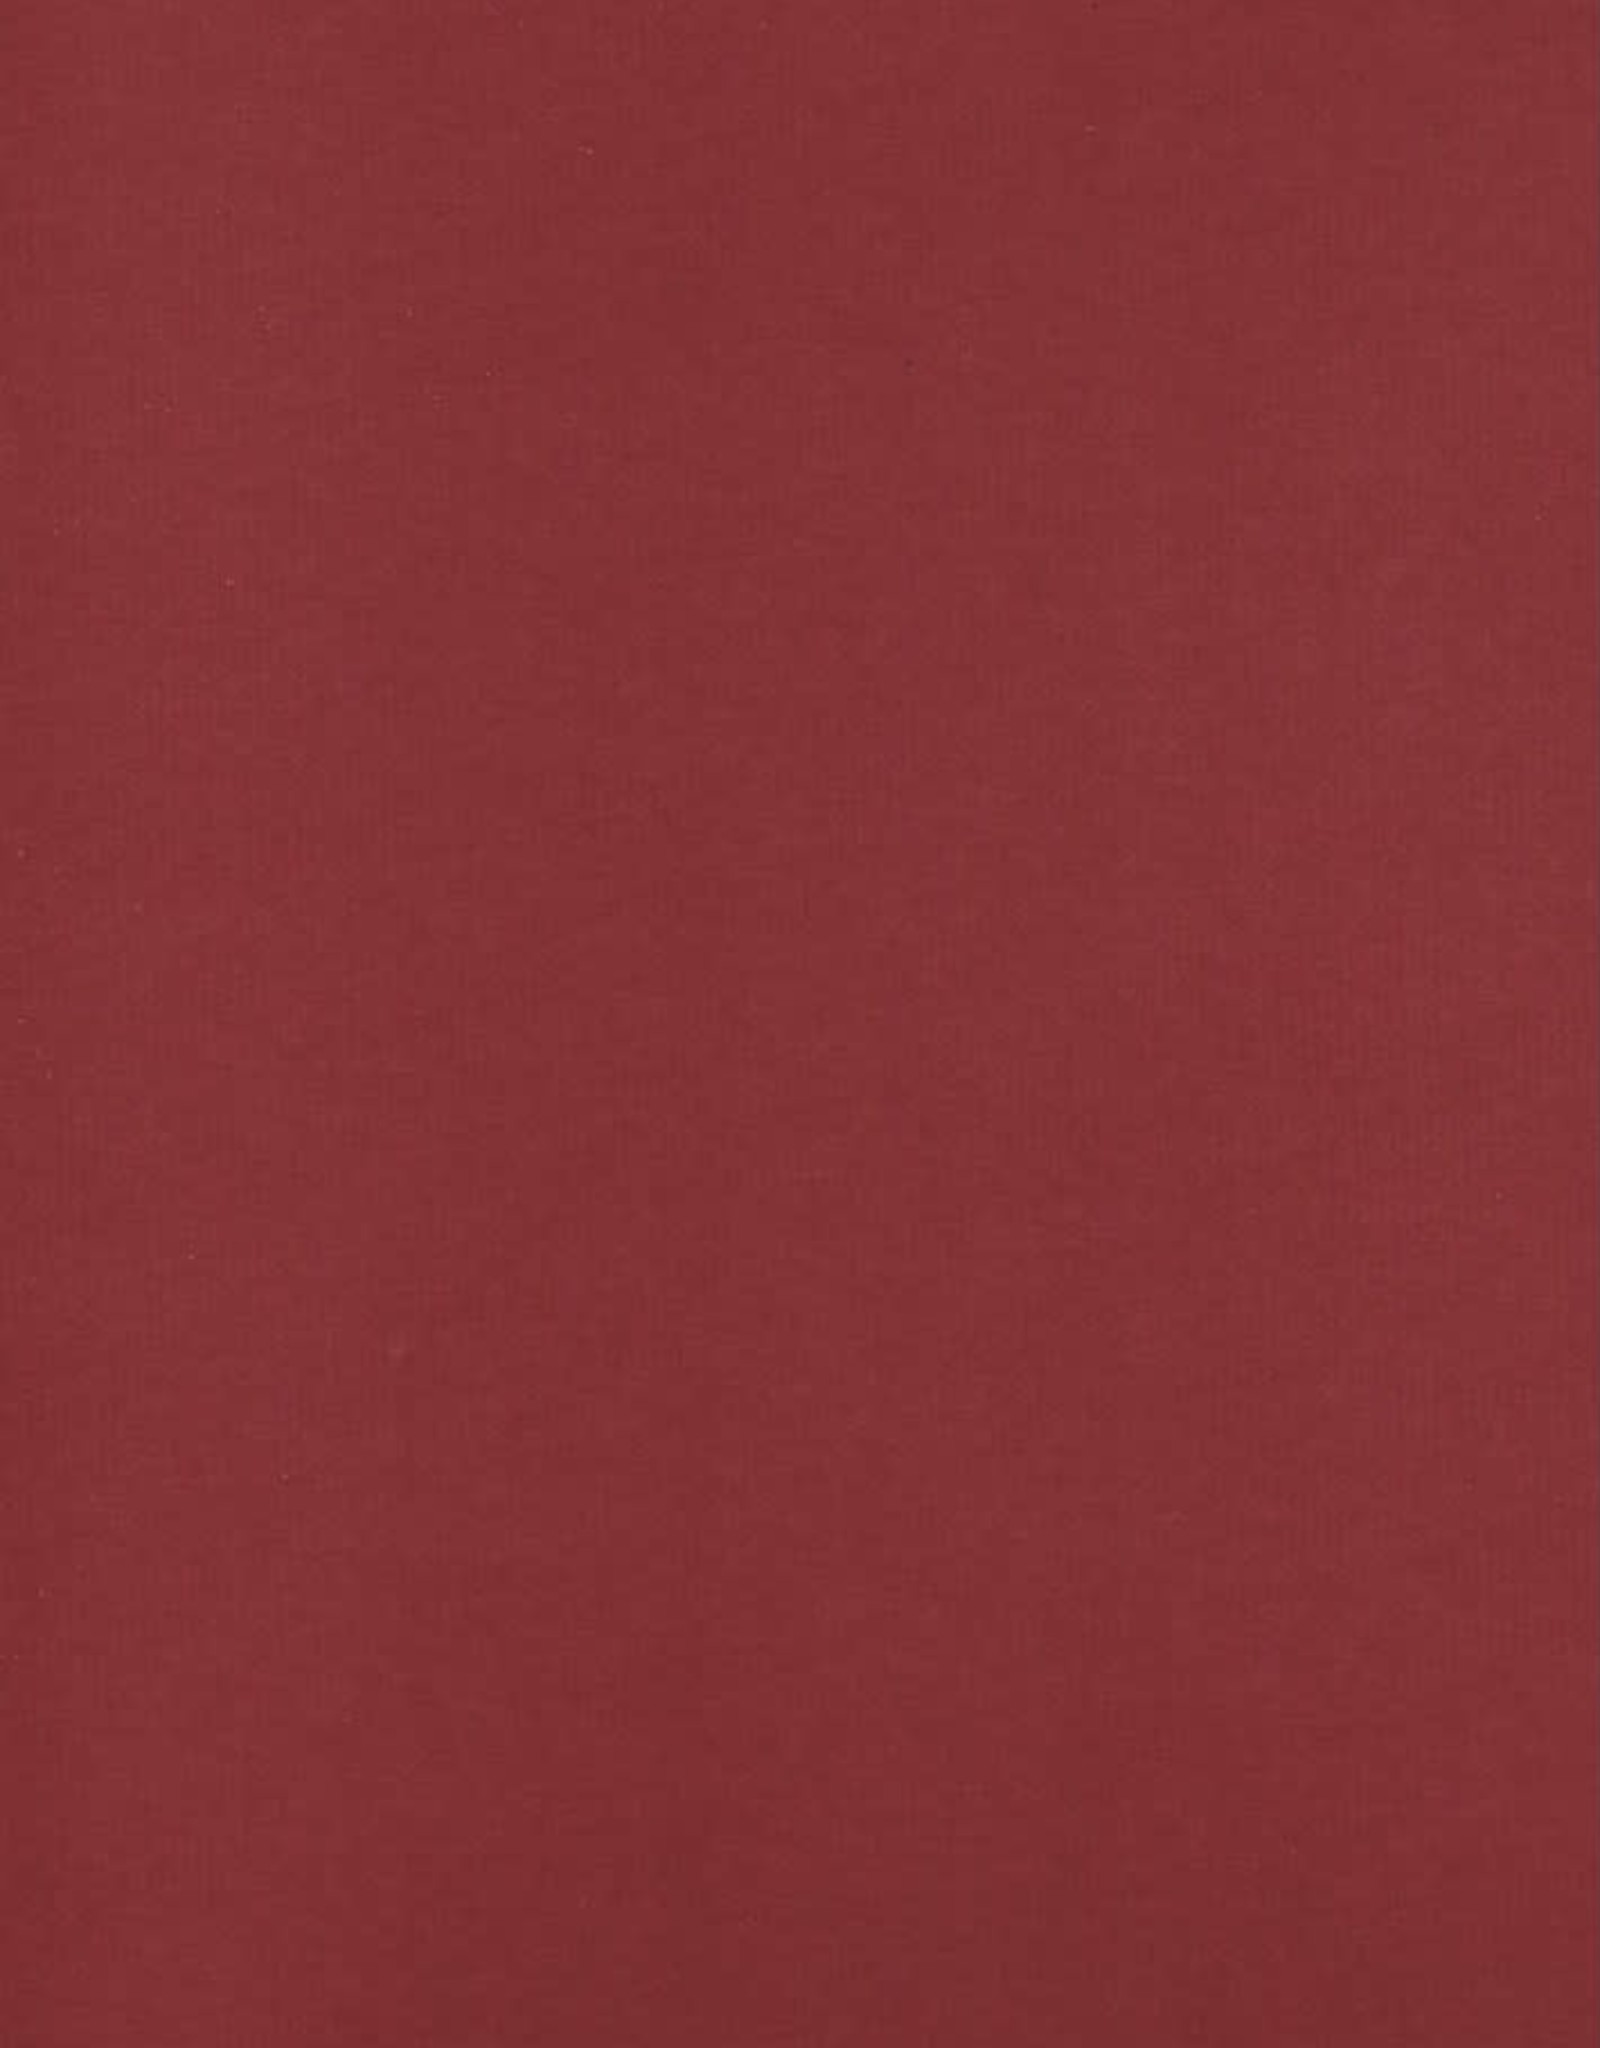 "Awagami Shin Inbe, Red Soil, 21"" x 31"", 105gsm"